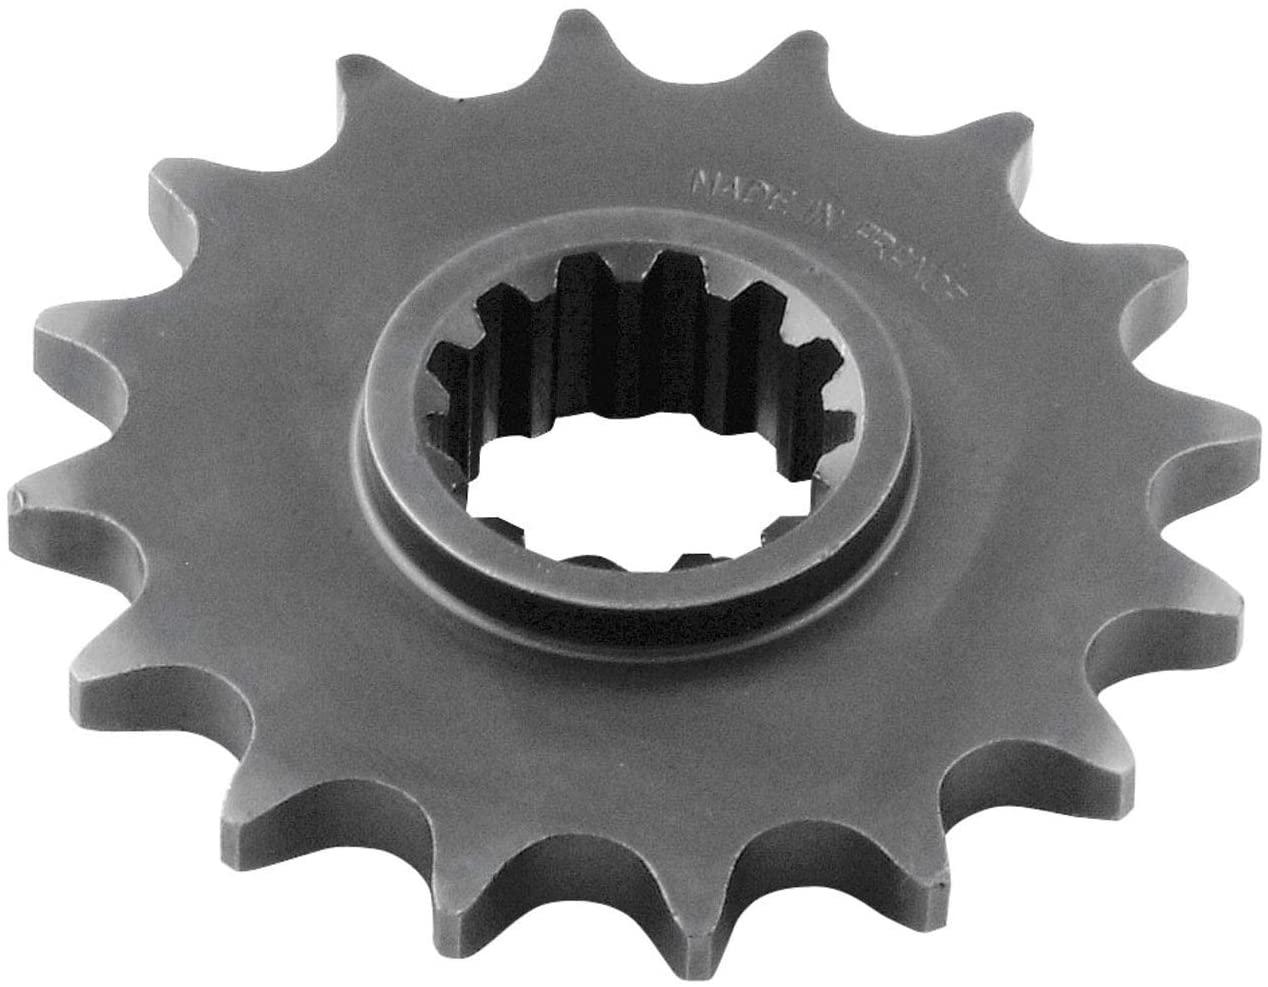 Sunstar Steel Front Sprocket - 16T , Sprocket Teeth: 16, Color: Natural, Sprocket Position: Front, Sprocket Size: 520, Material: Steel 39616